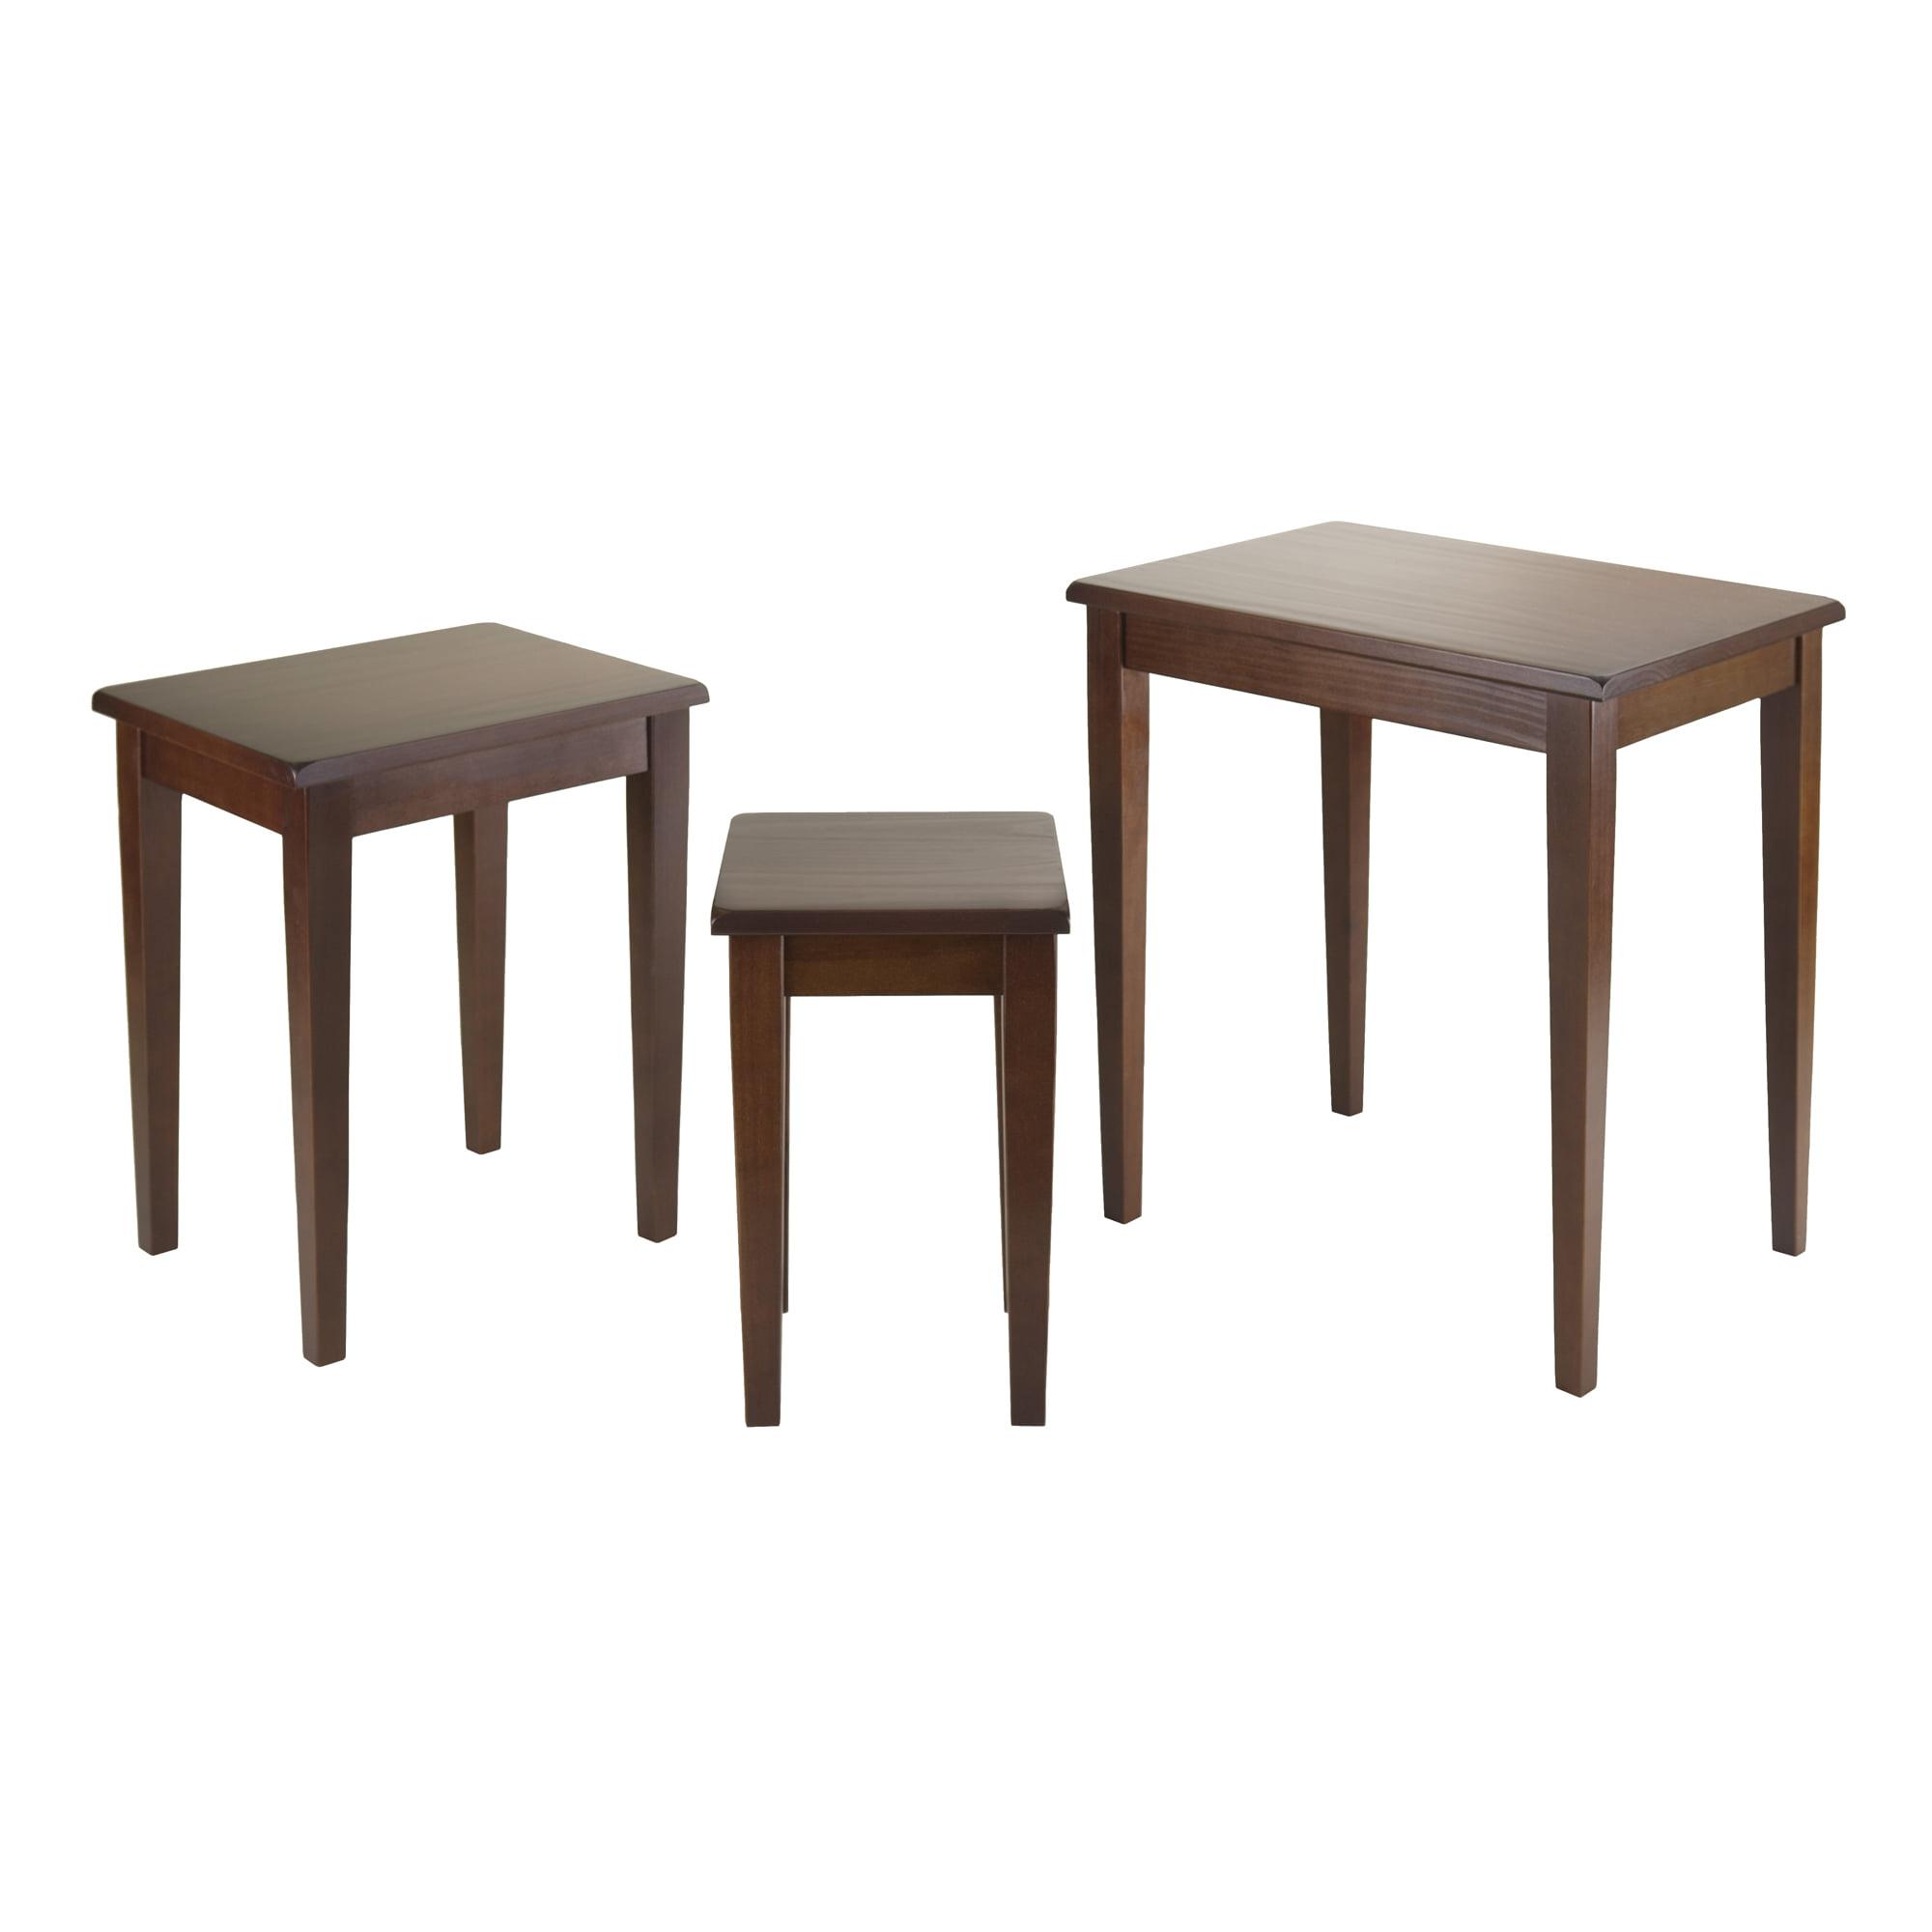 Winsome Wood Regalia 3 Piece Nesting Table Set Walnut Finish Walmart Com Walmart Com